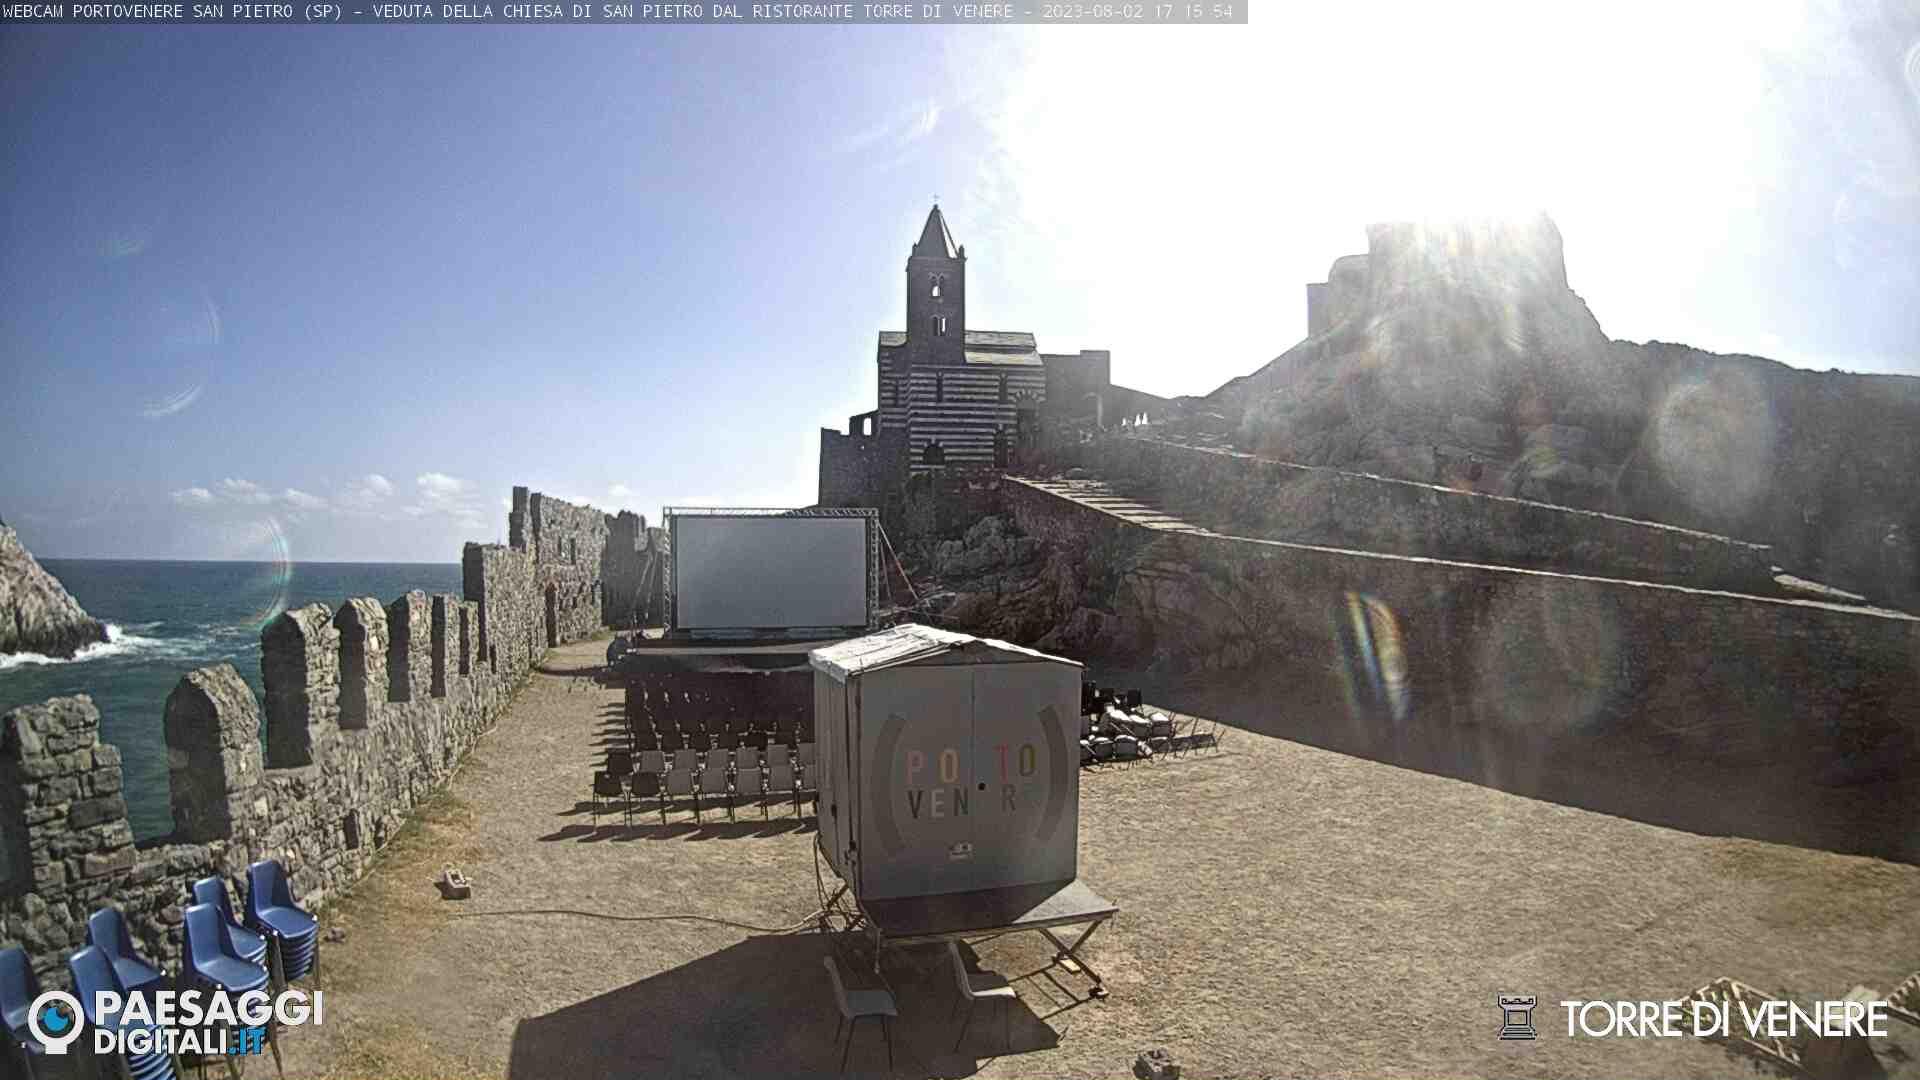 Webcam Portovenere, San Pietro